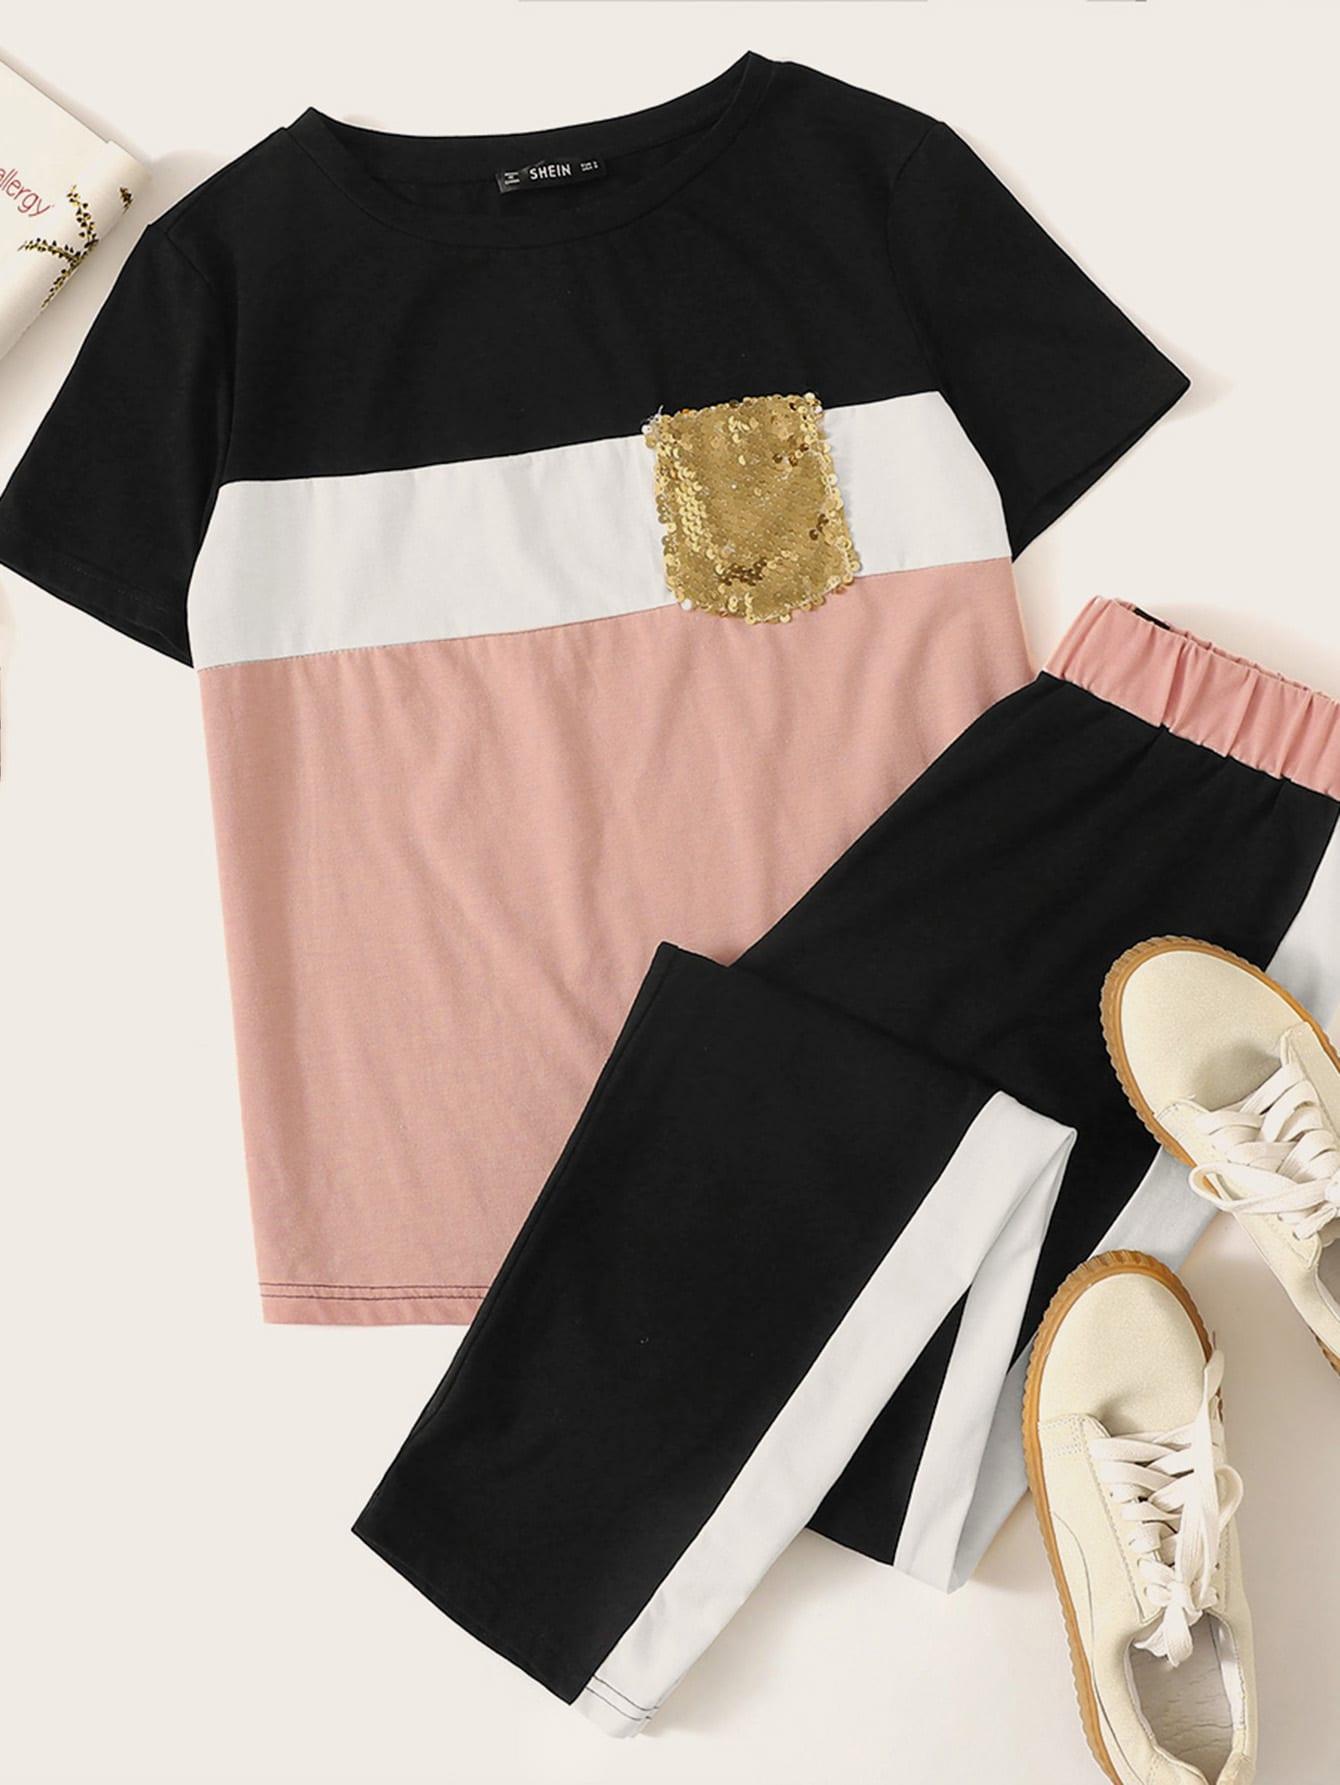 Фото - Контрастные топ с блестками на кармане и брюки от SheIn цвет многоцветный